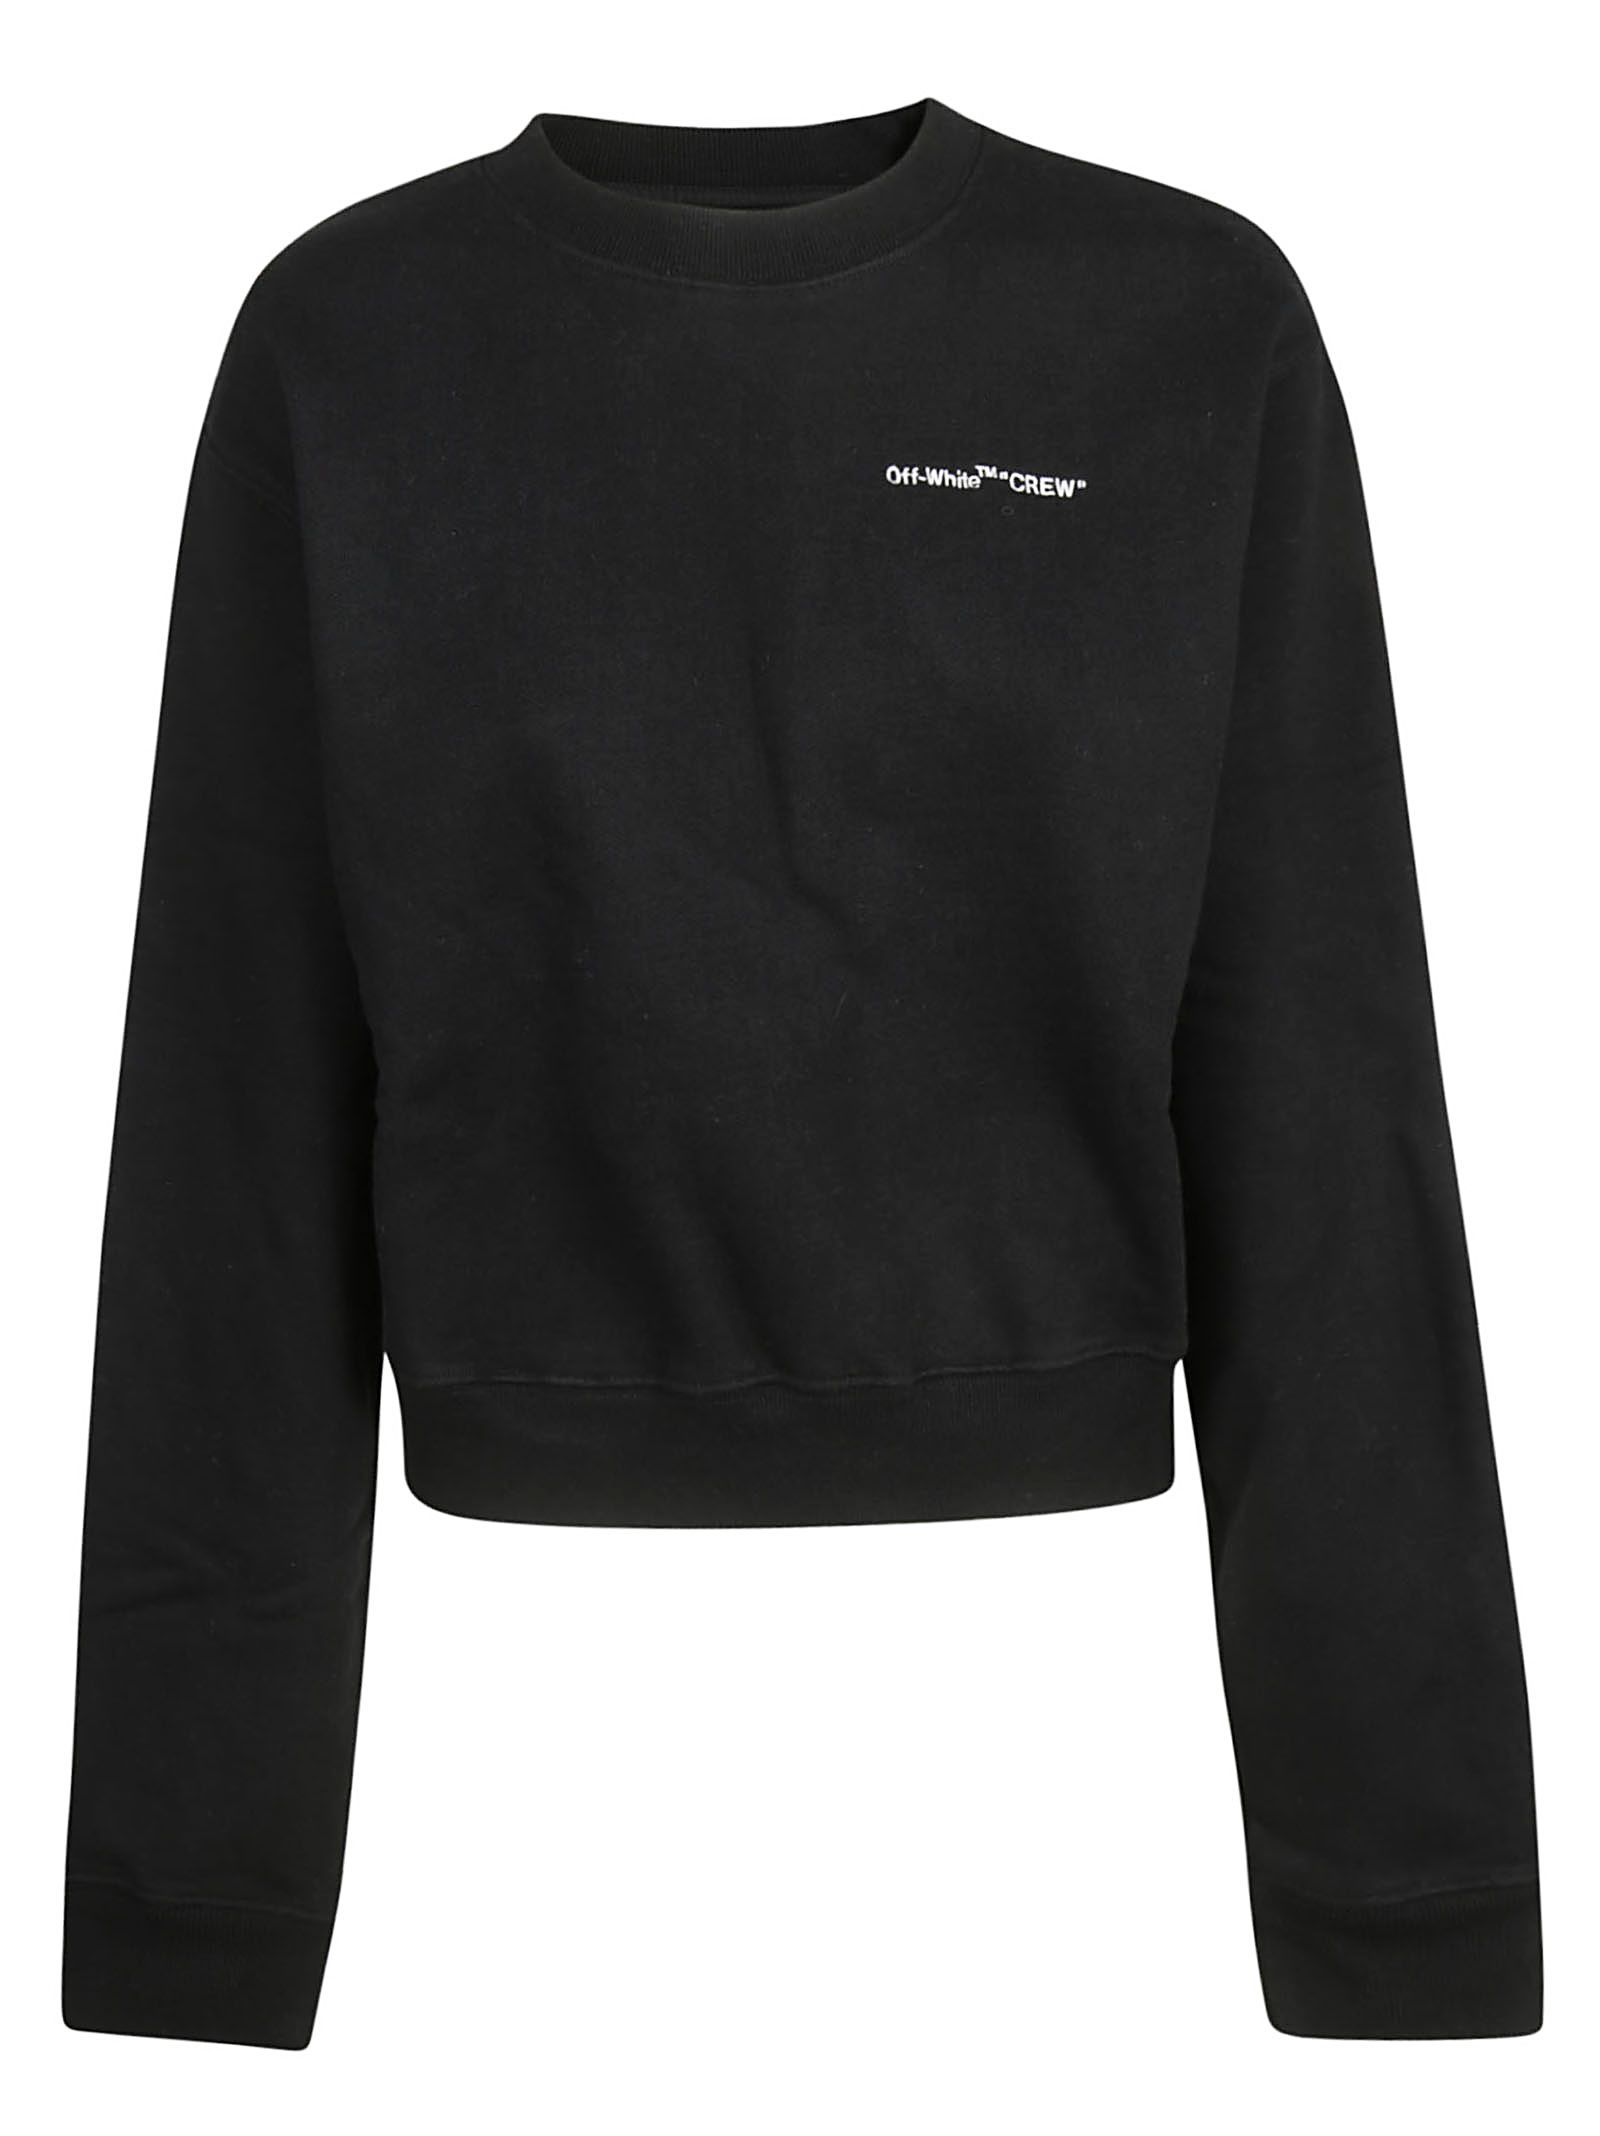 910490aa11f9 Off-White Logo Print Sweatshirt - Black White ...